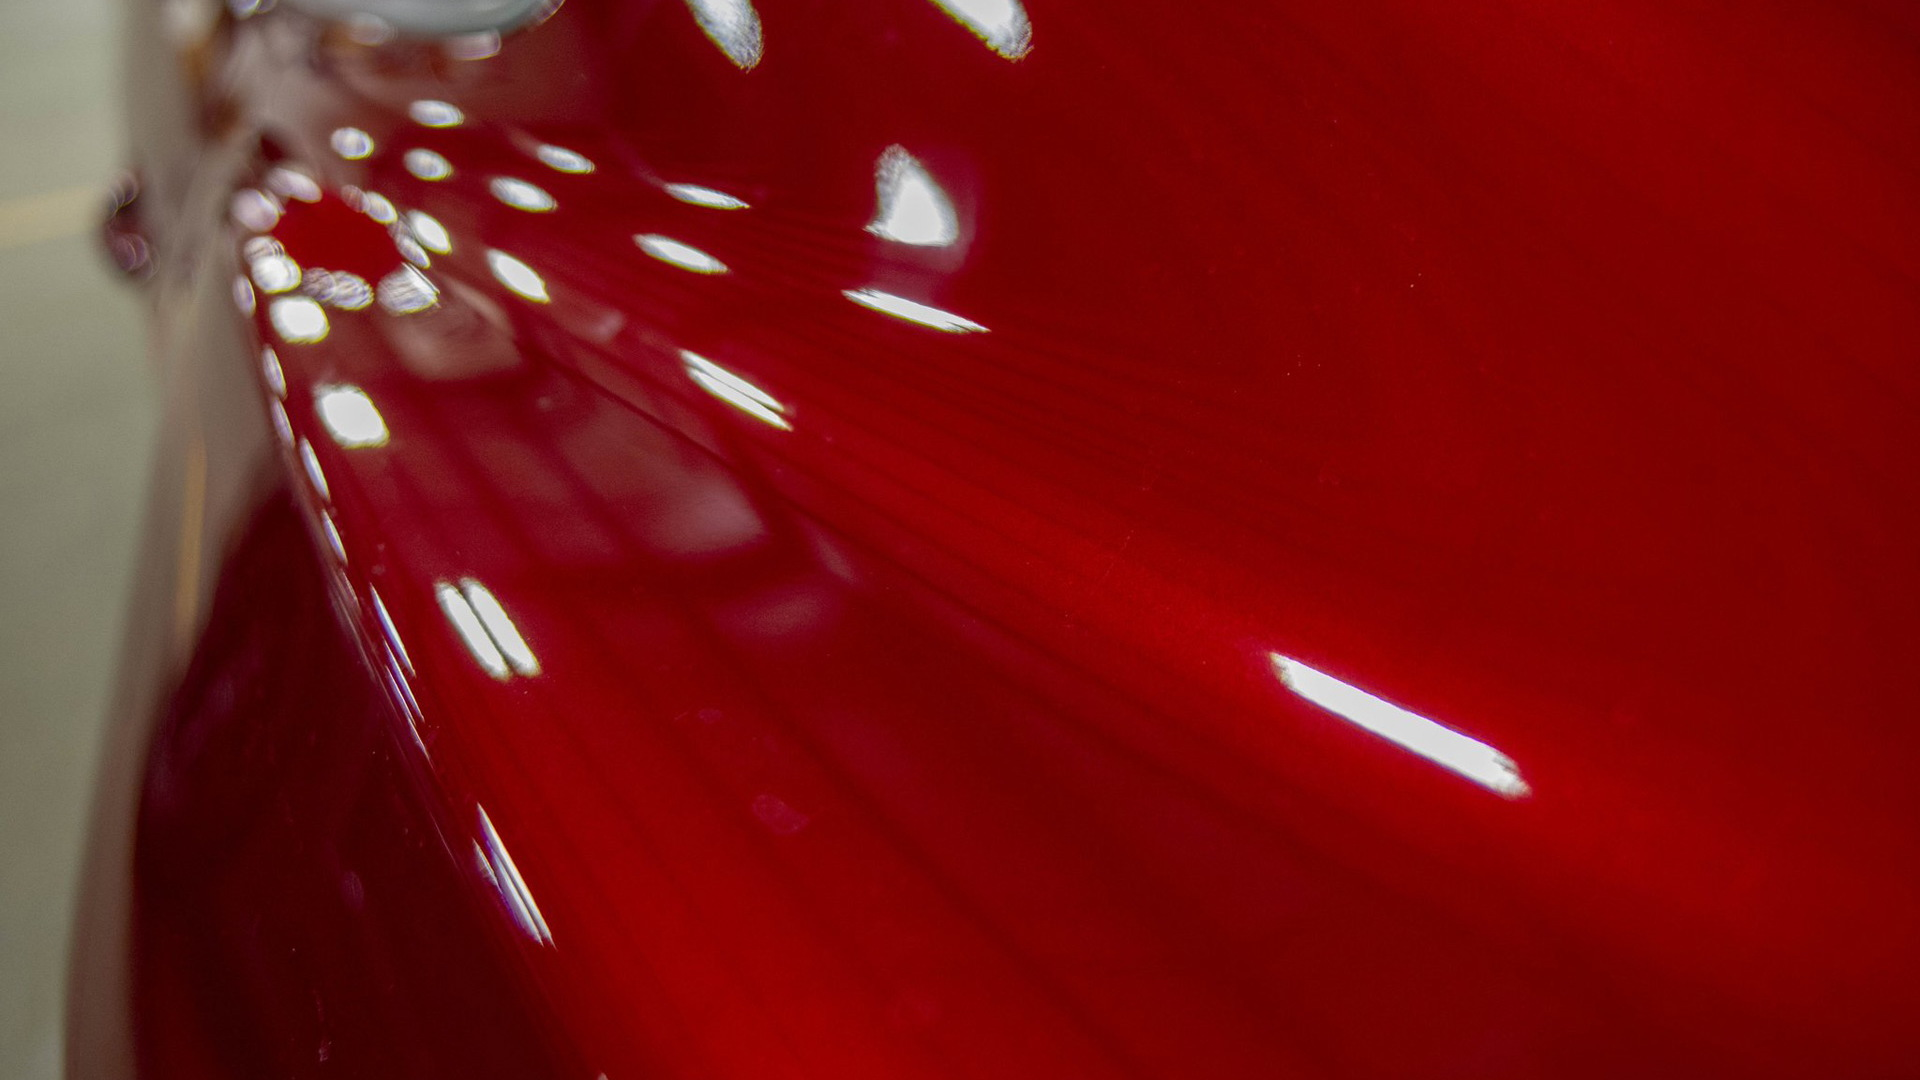 Teaser for 2020 Jack Roush Edition Mustang debuting at 2019 SEMA show